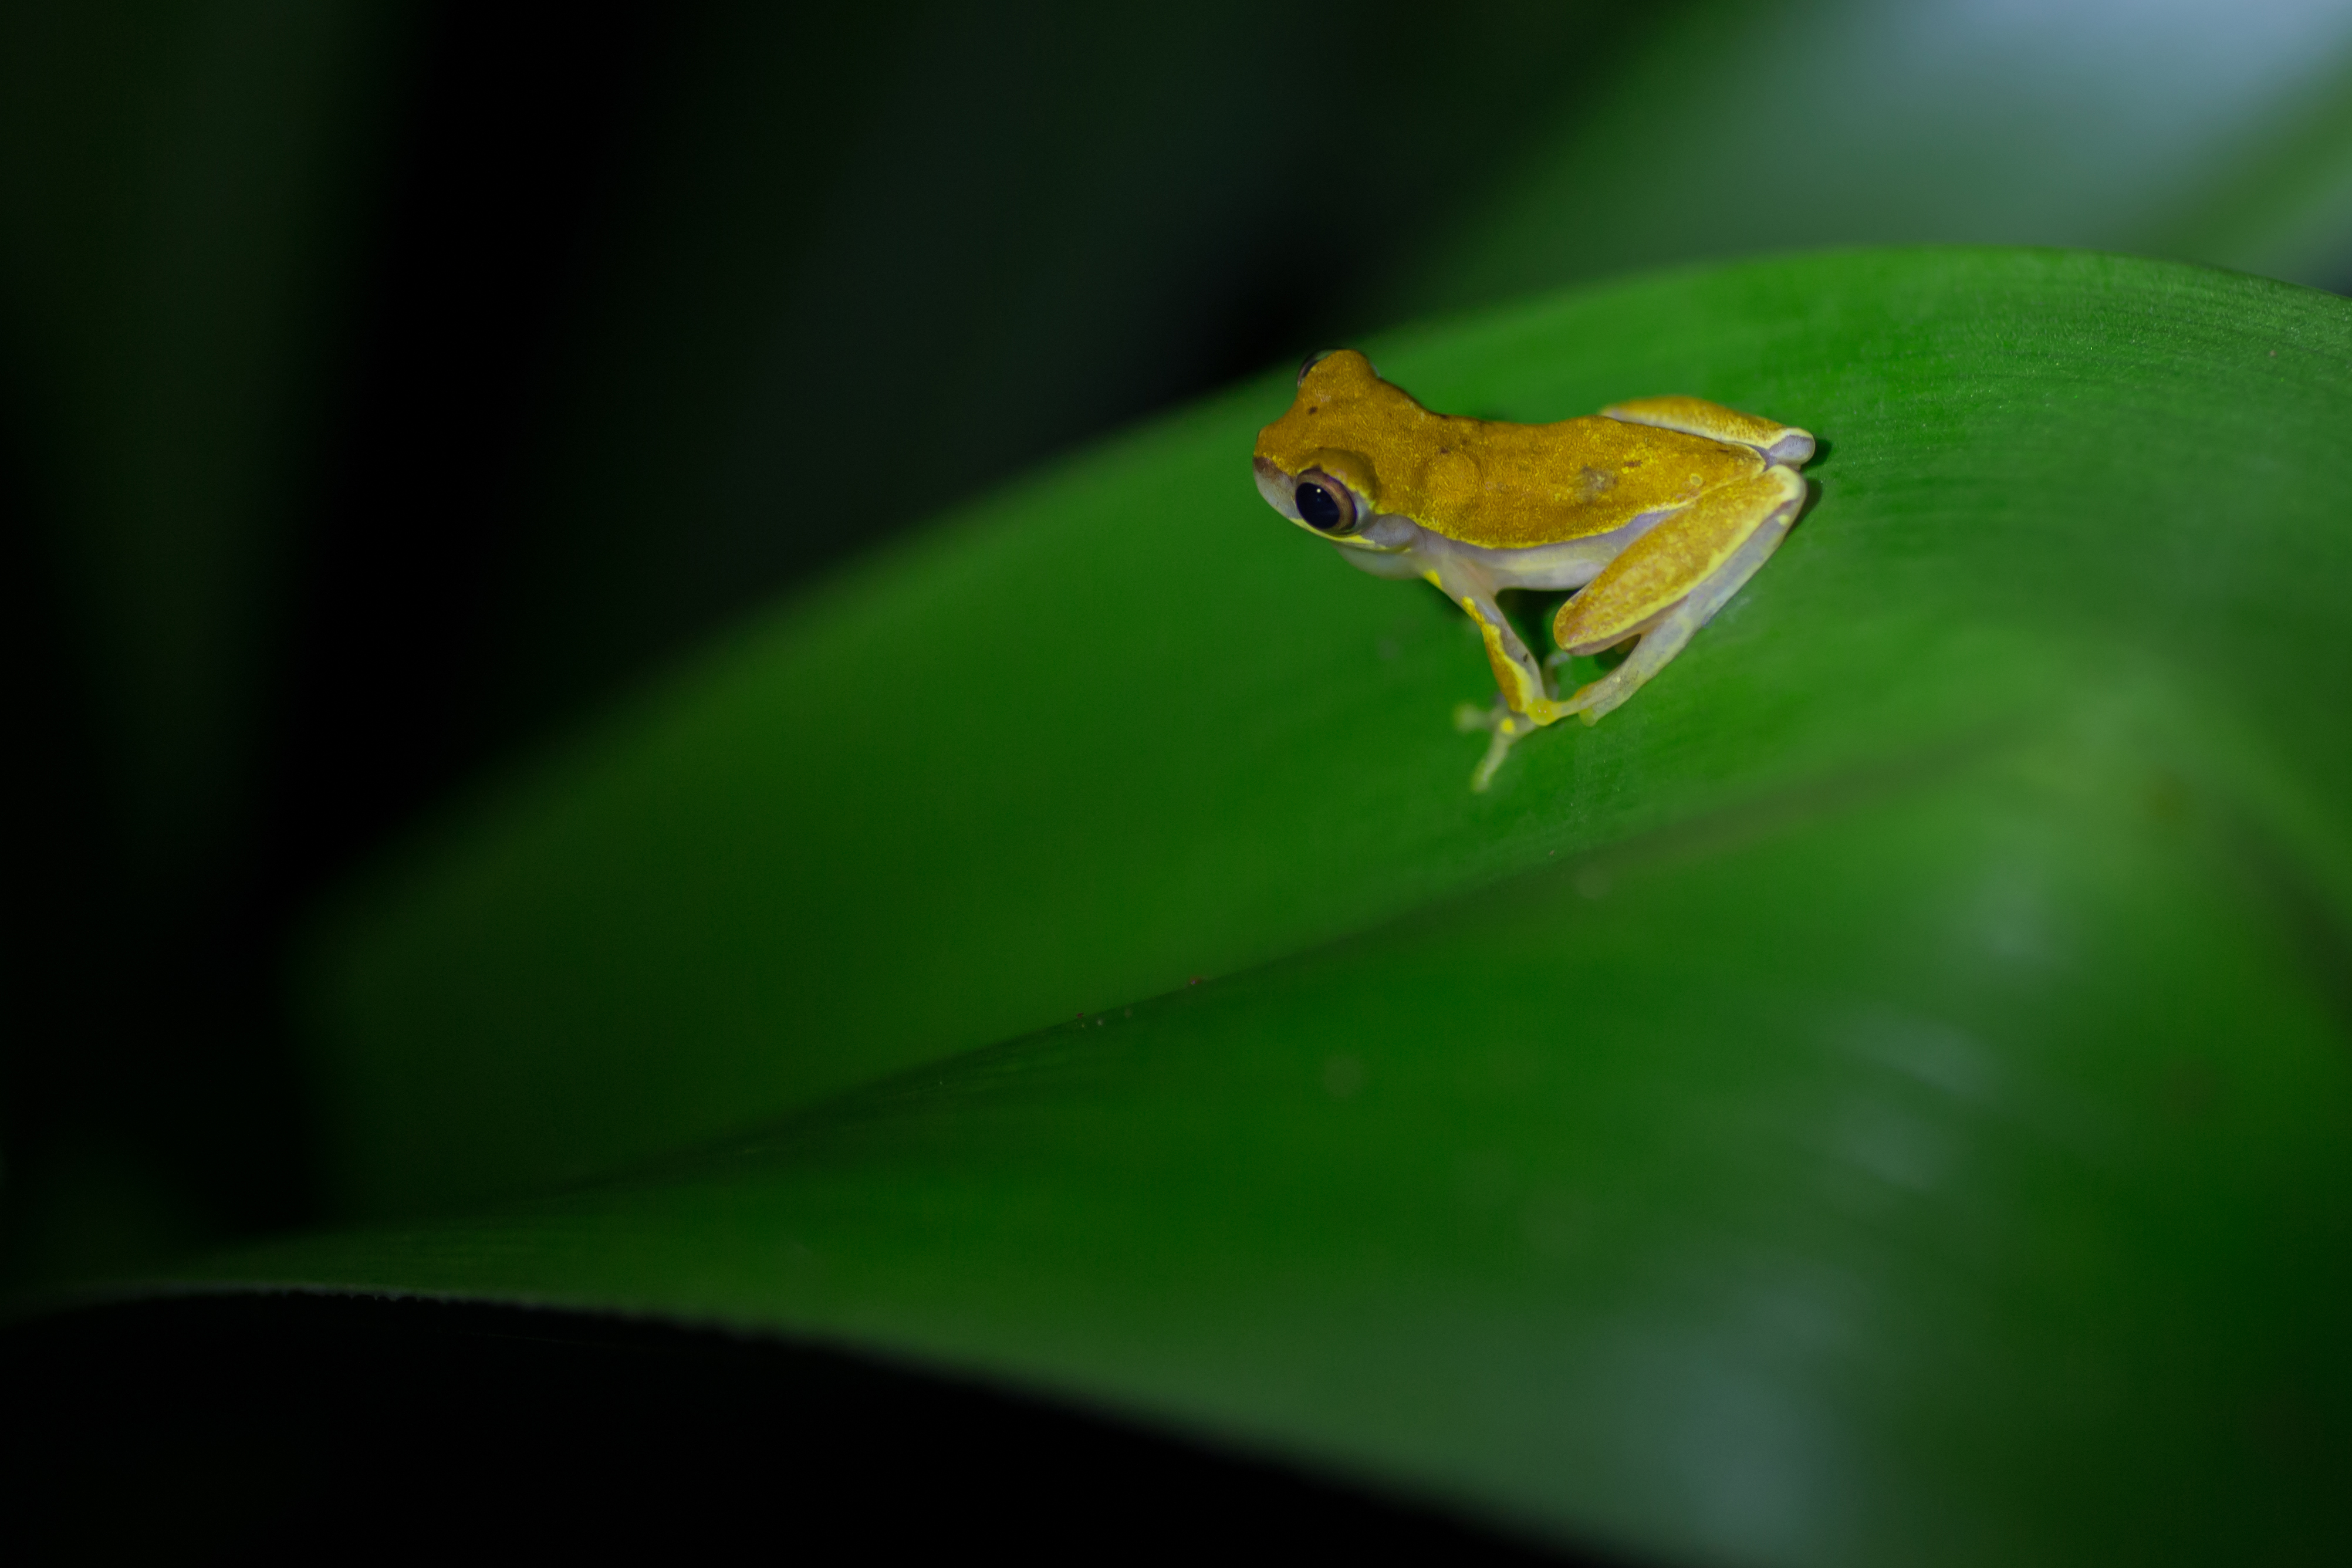 Rana sp - Costa Rica